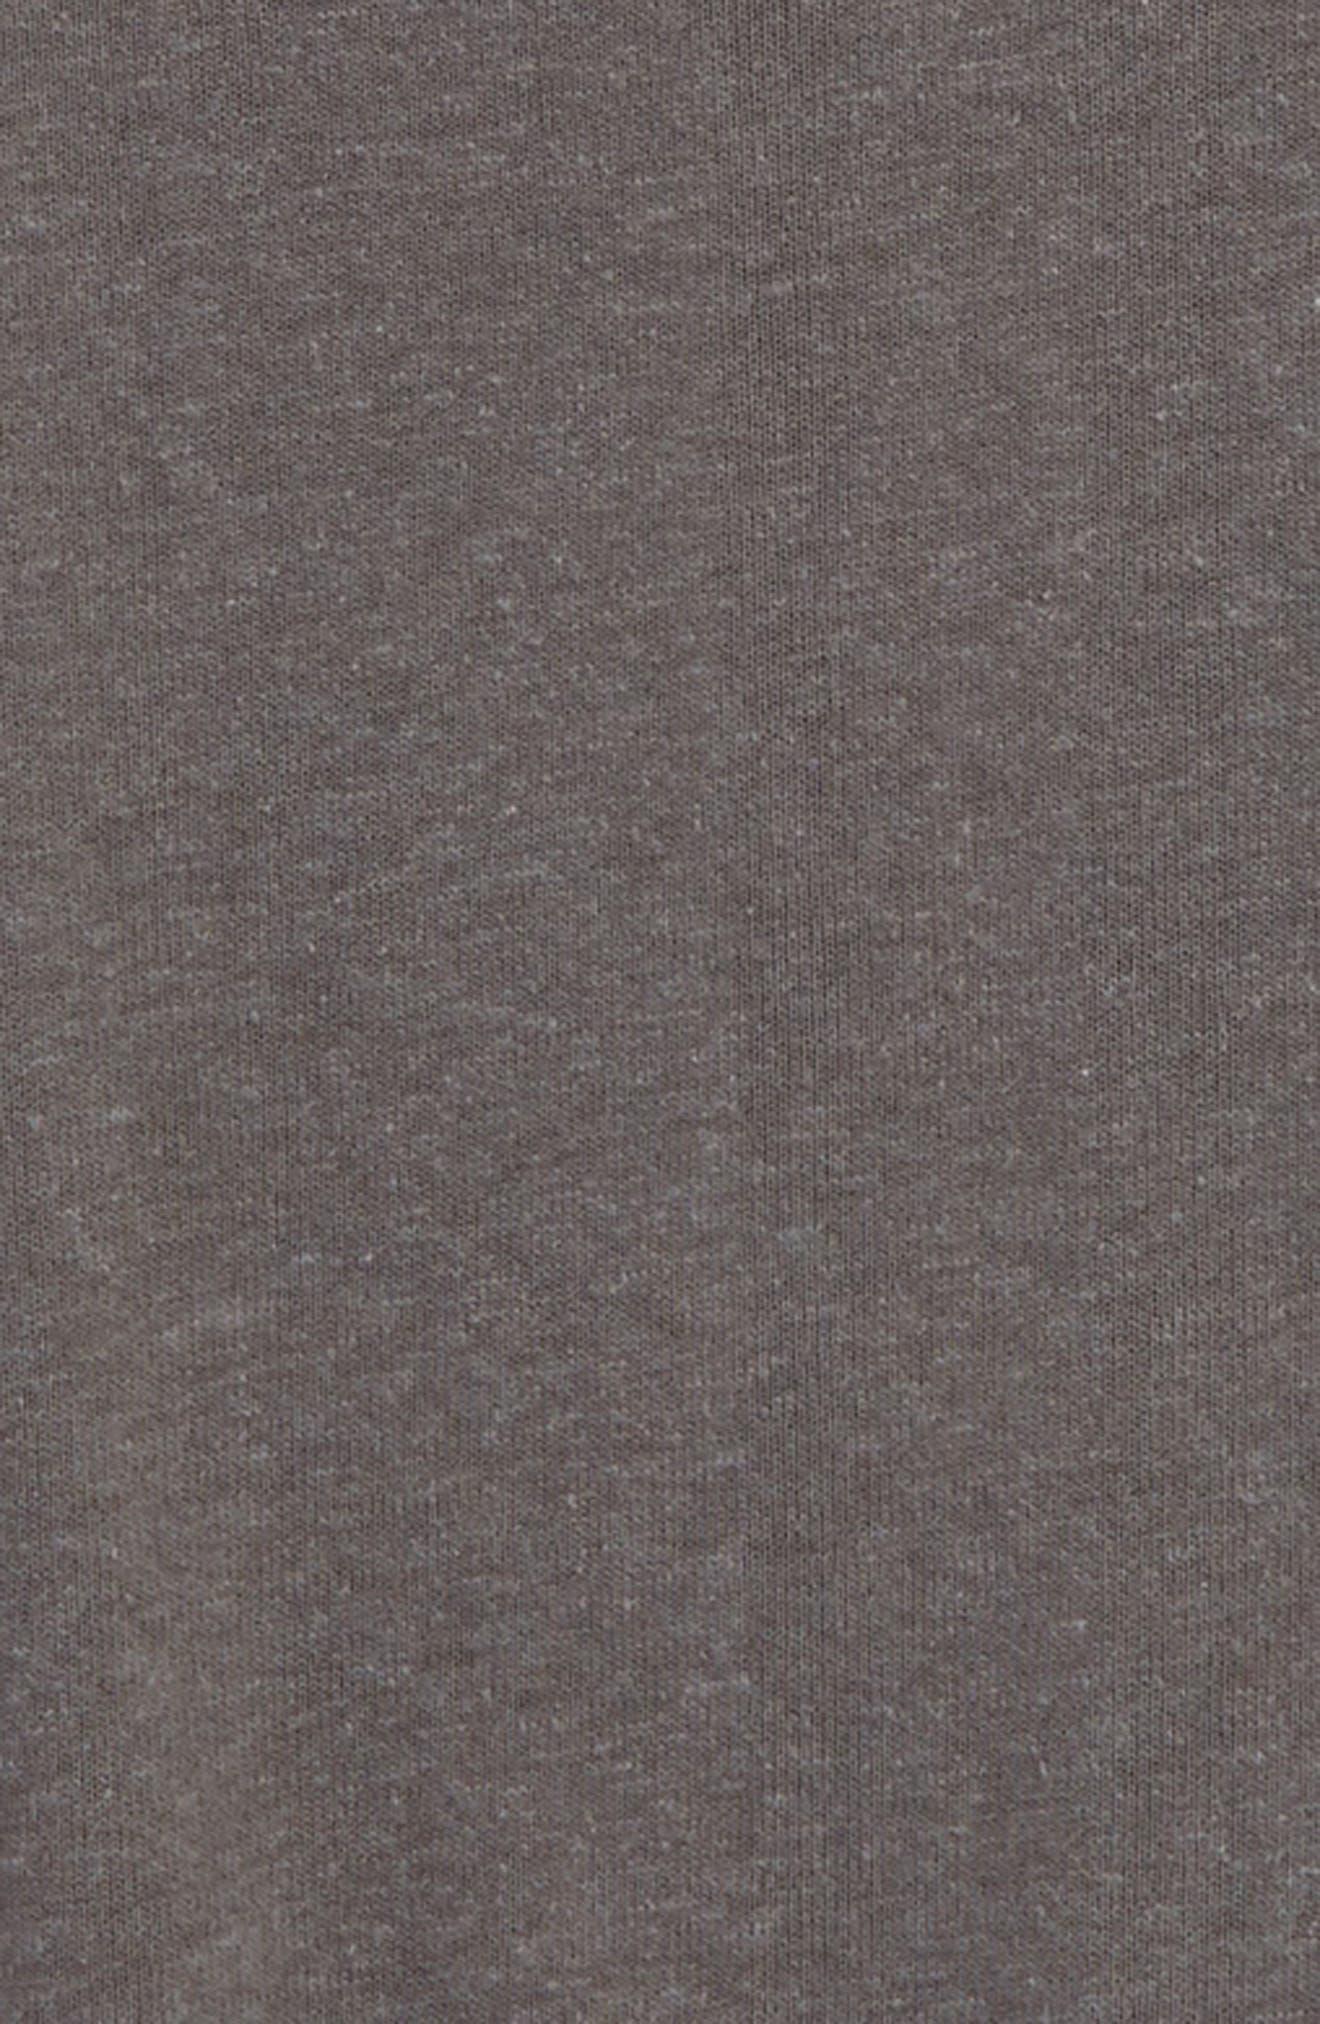 Ruffle Sweatshirt,                             Alternate thumbnail 3, color,                             030